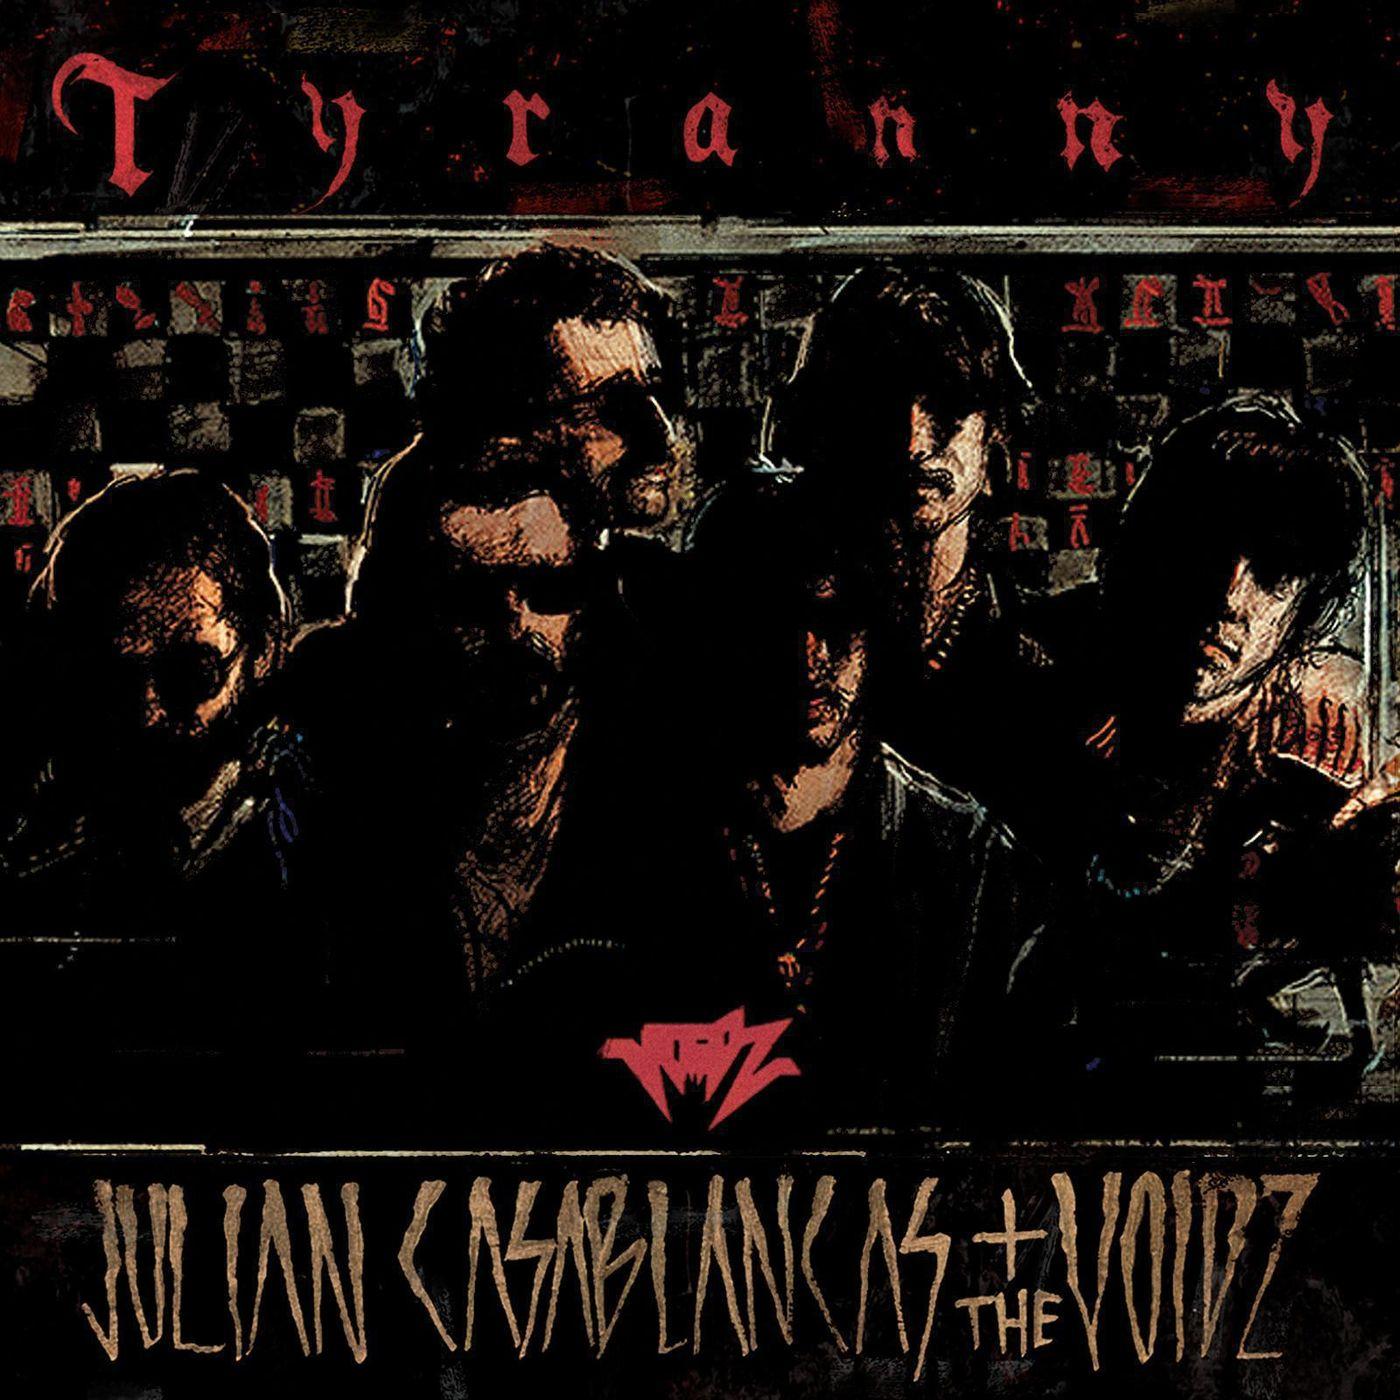 Julian Casablancas + The Voidz - Tyranny album cover